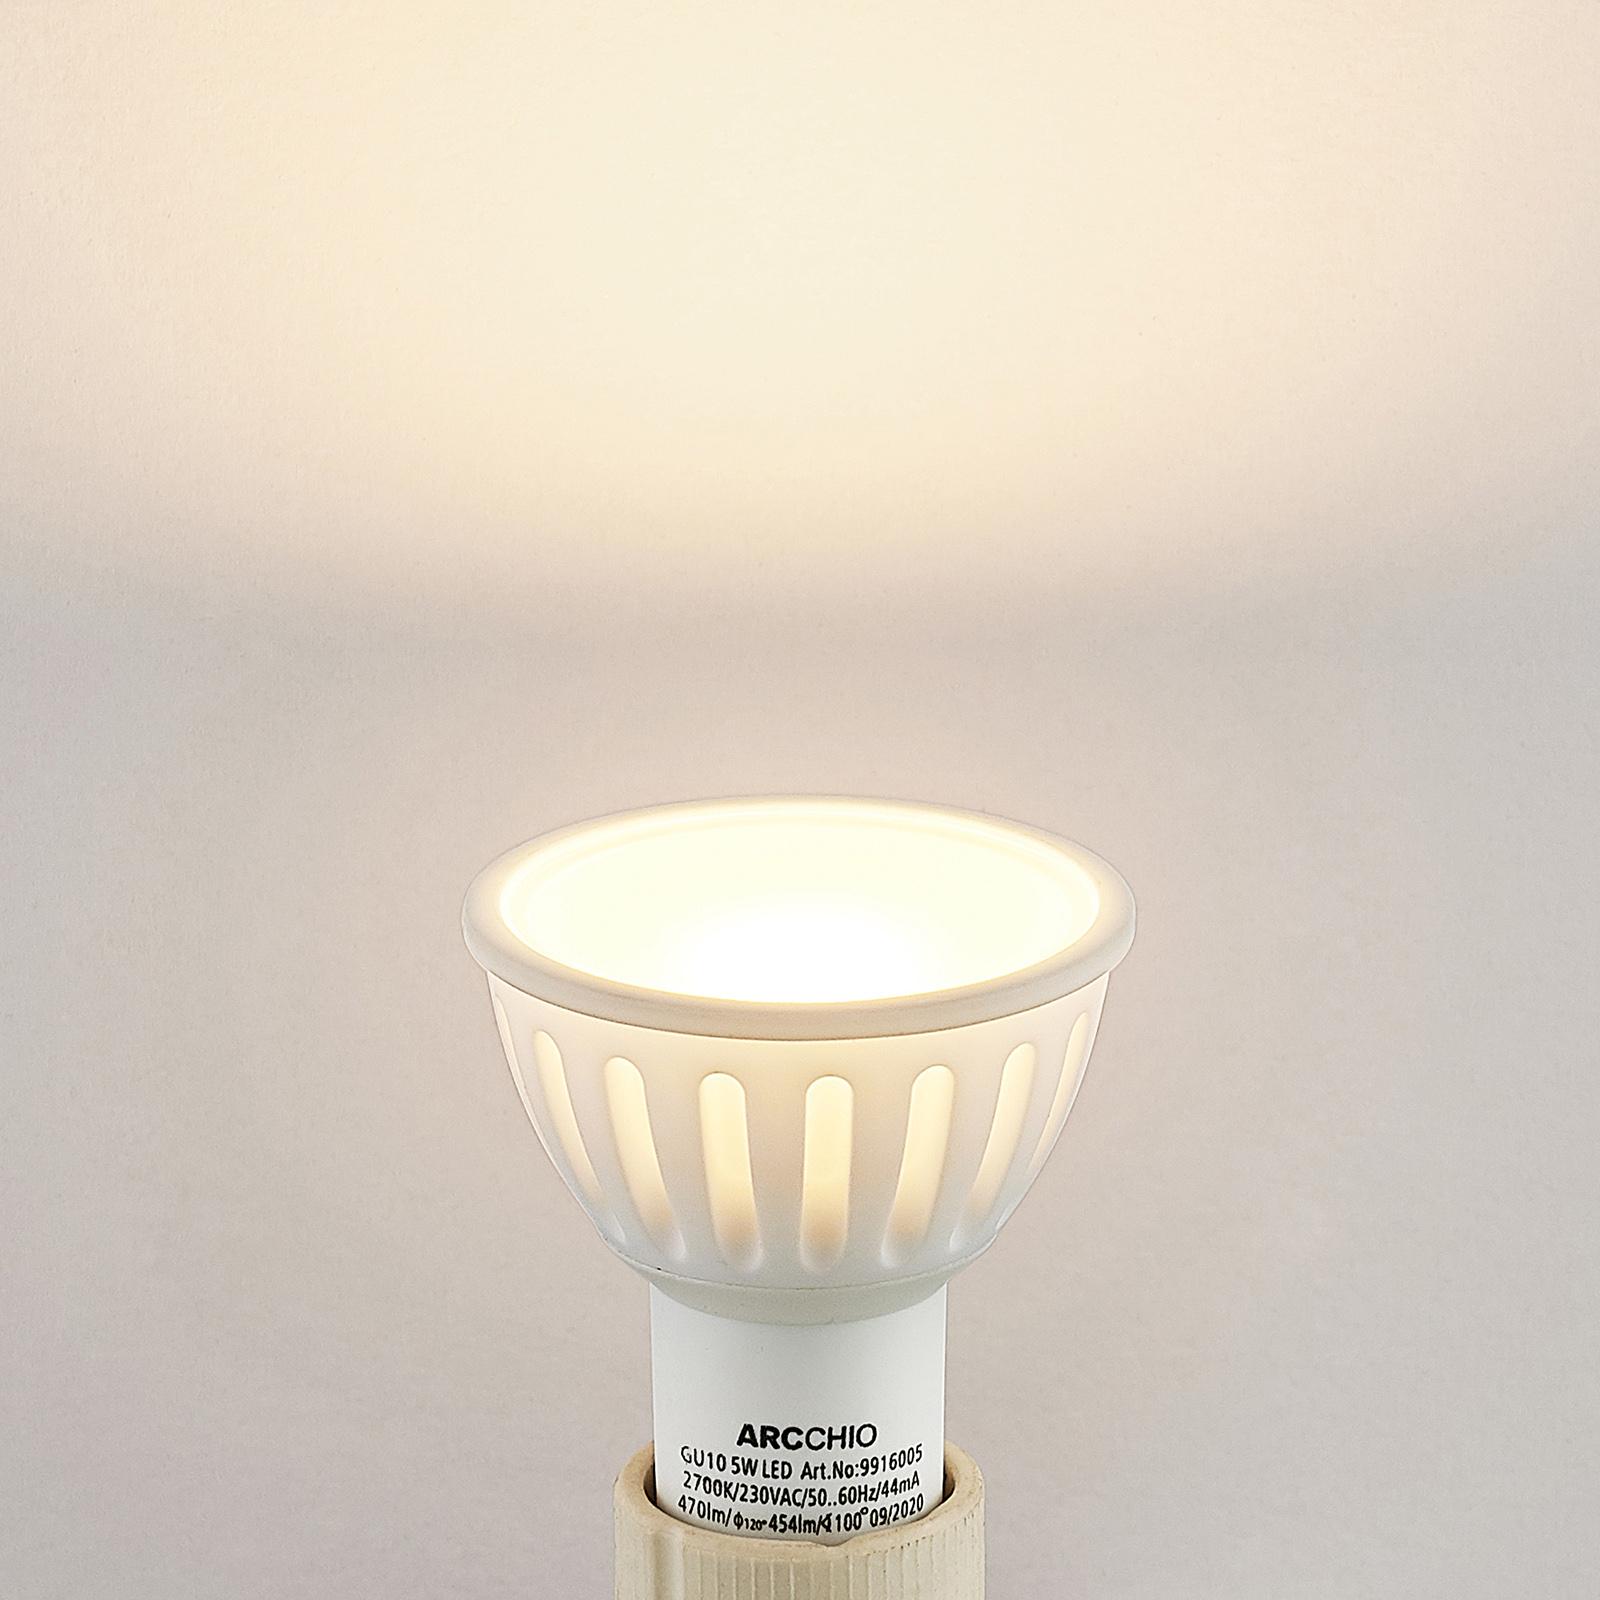 Arcchio-LED-heljastinlamppu GU10 100° 5W 2 700 K